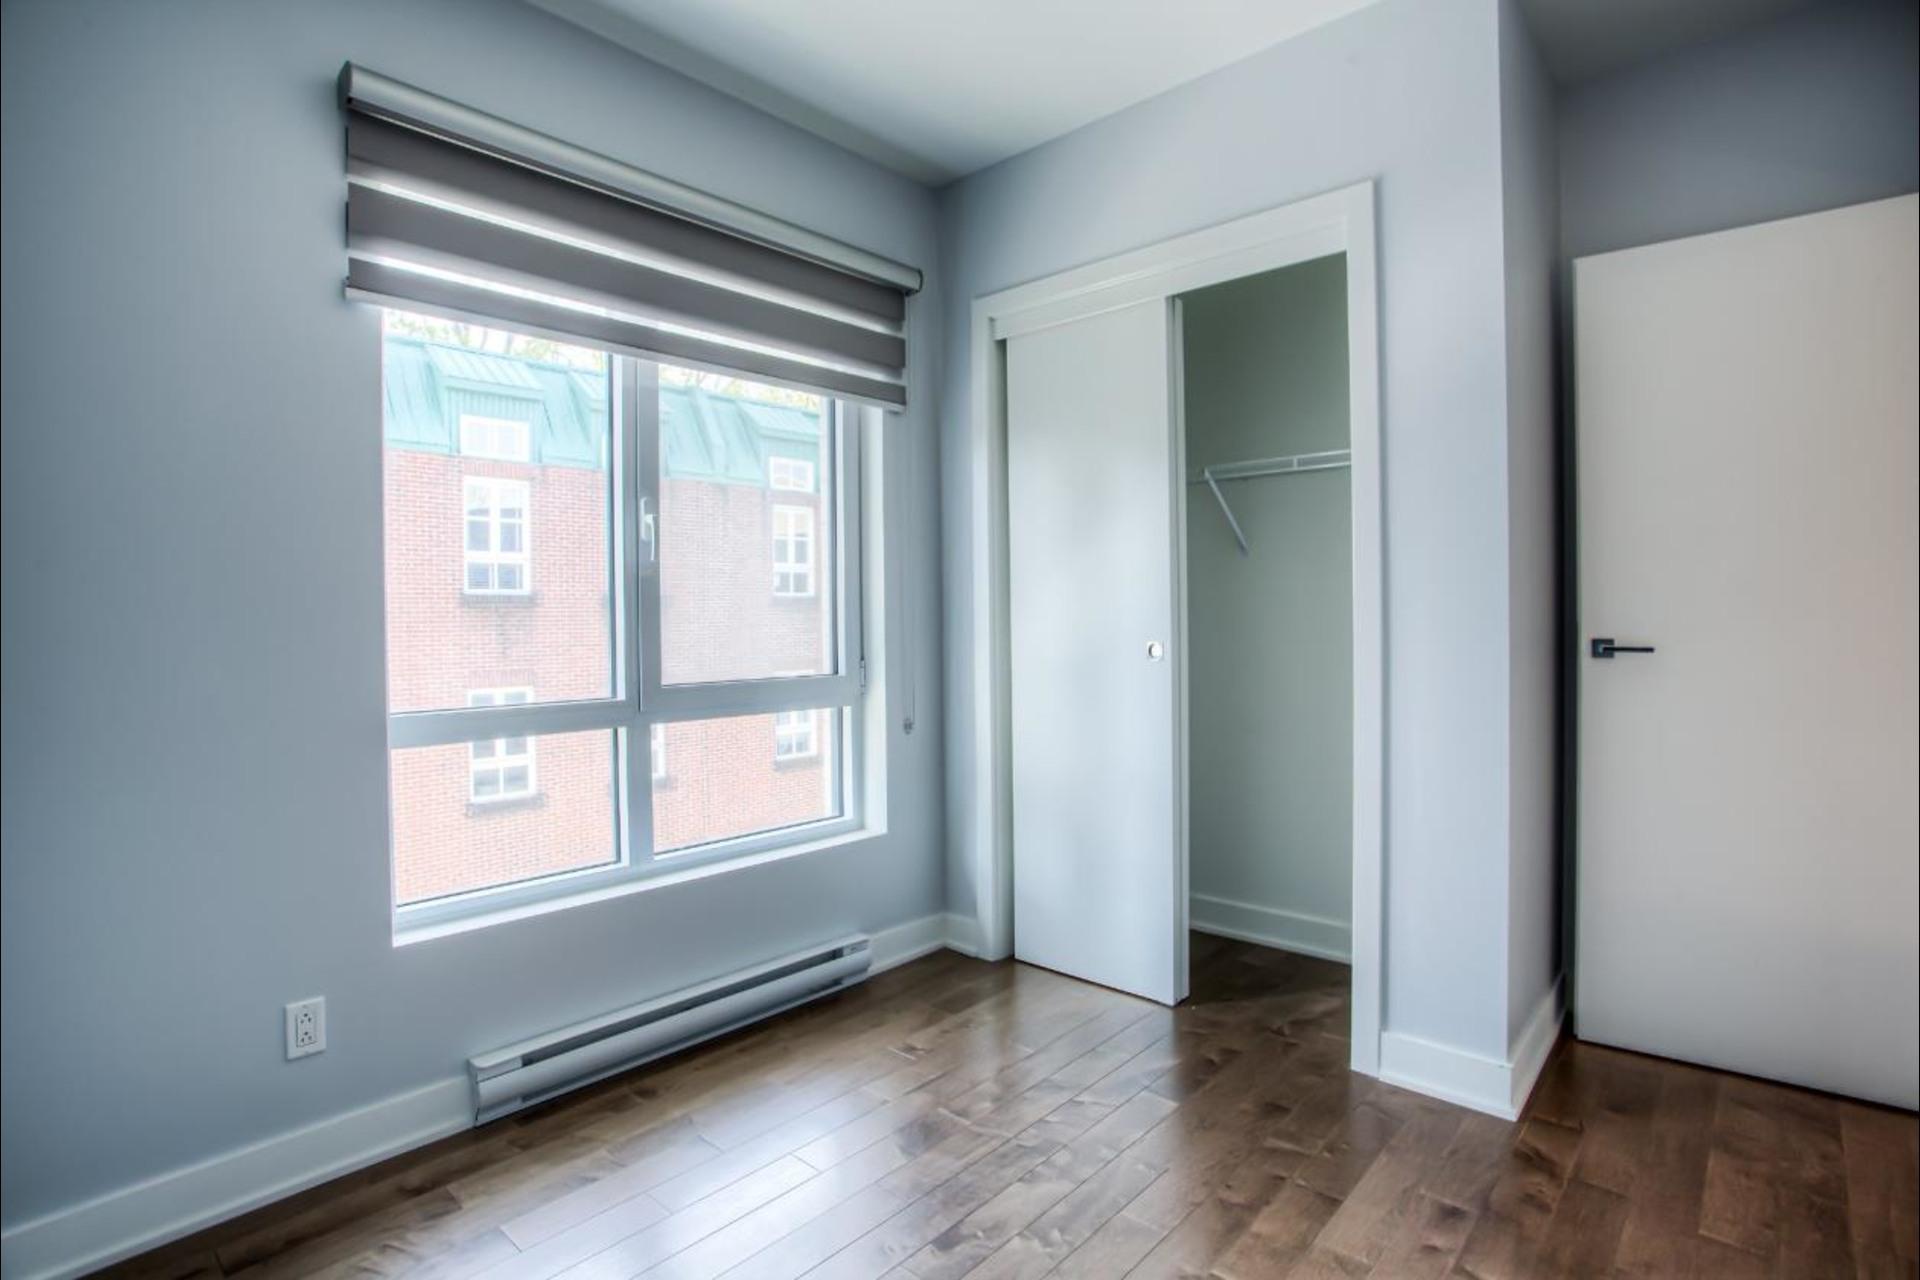 image 10 - 公寓 出租 Montréal - 6 室